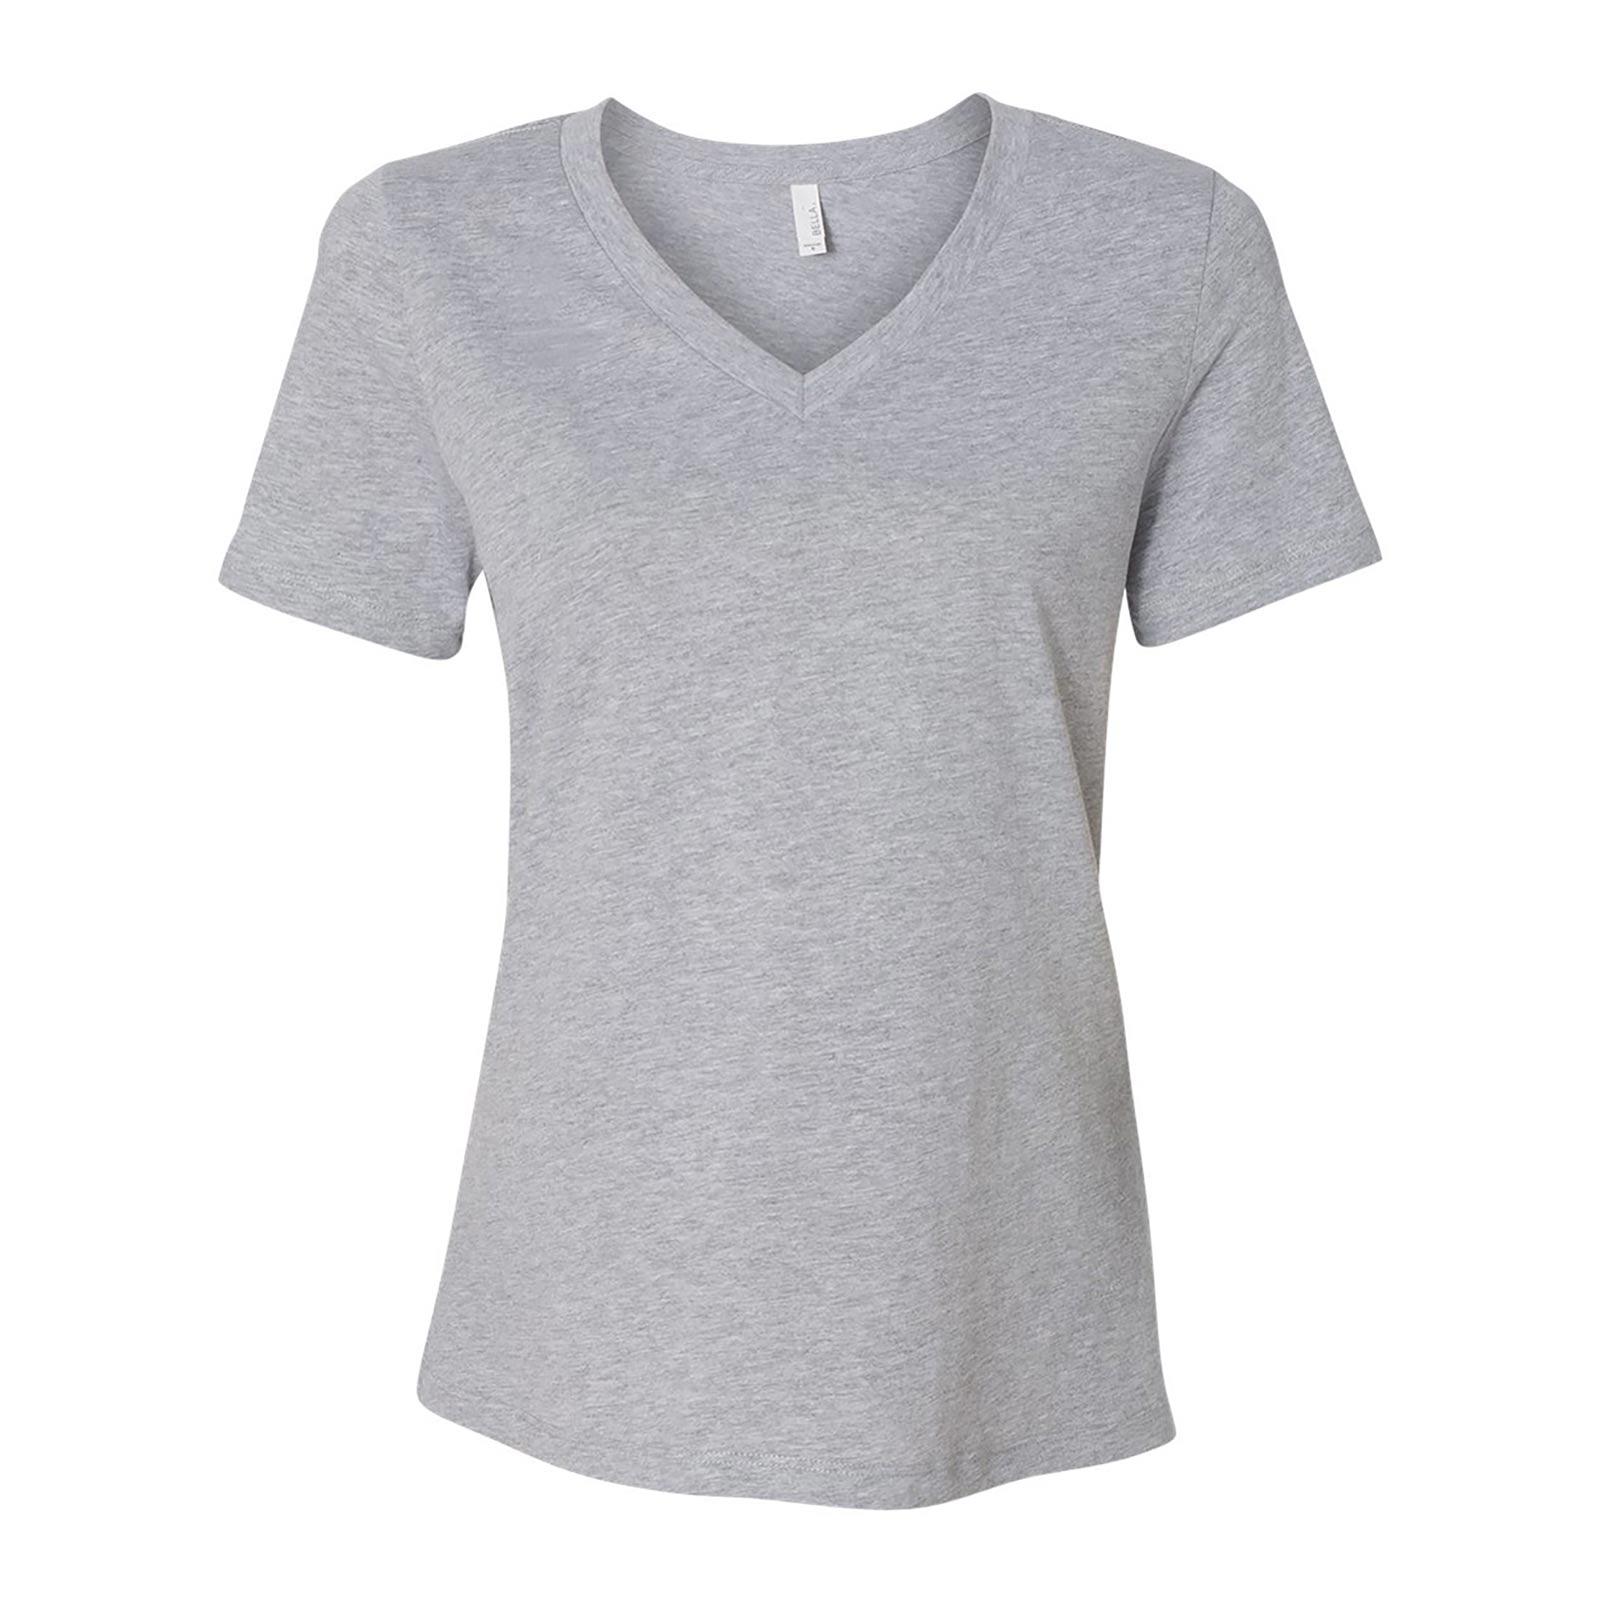 Athletic heather gray